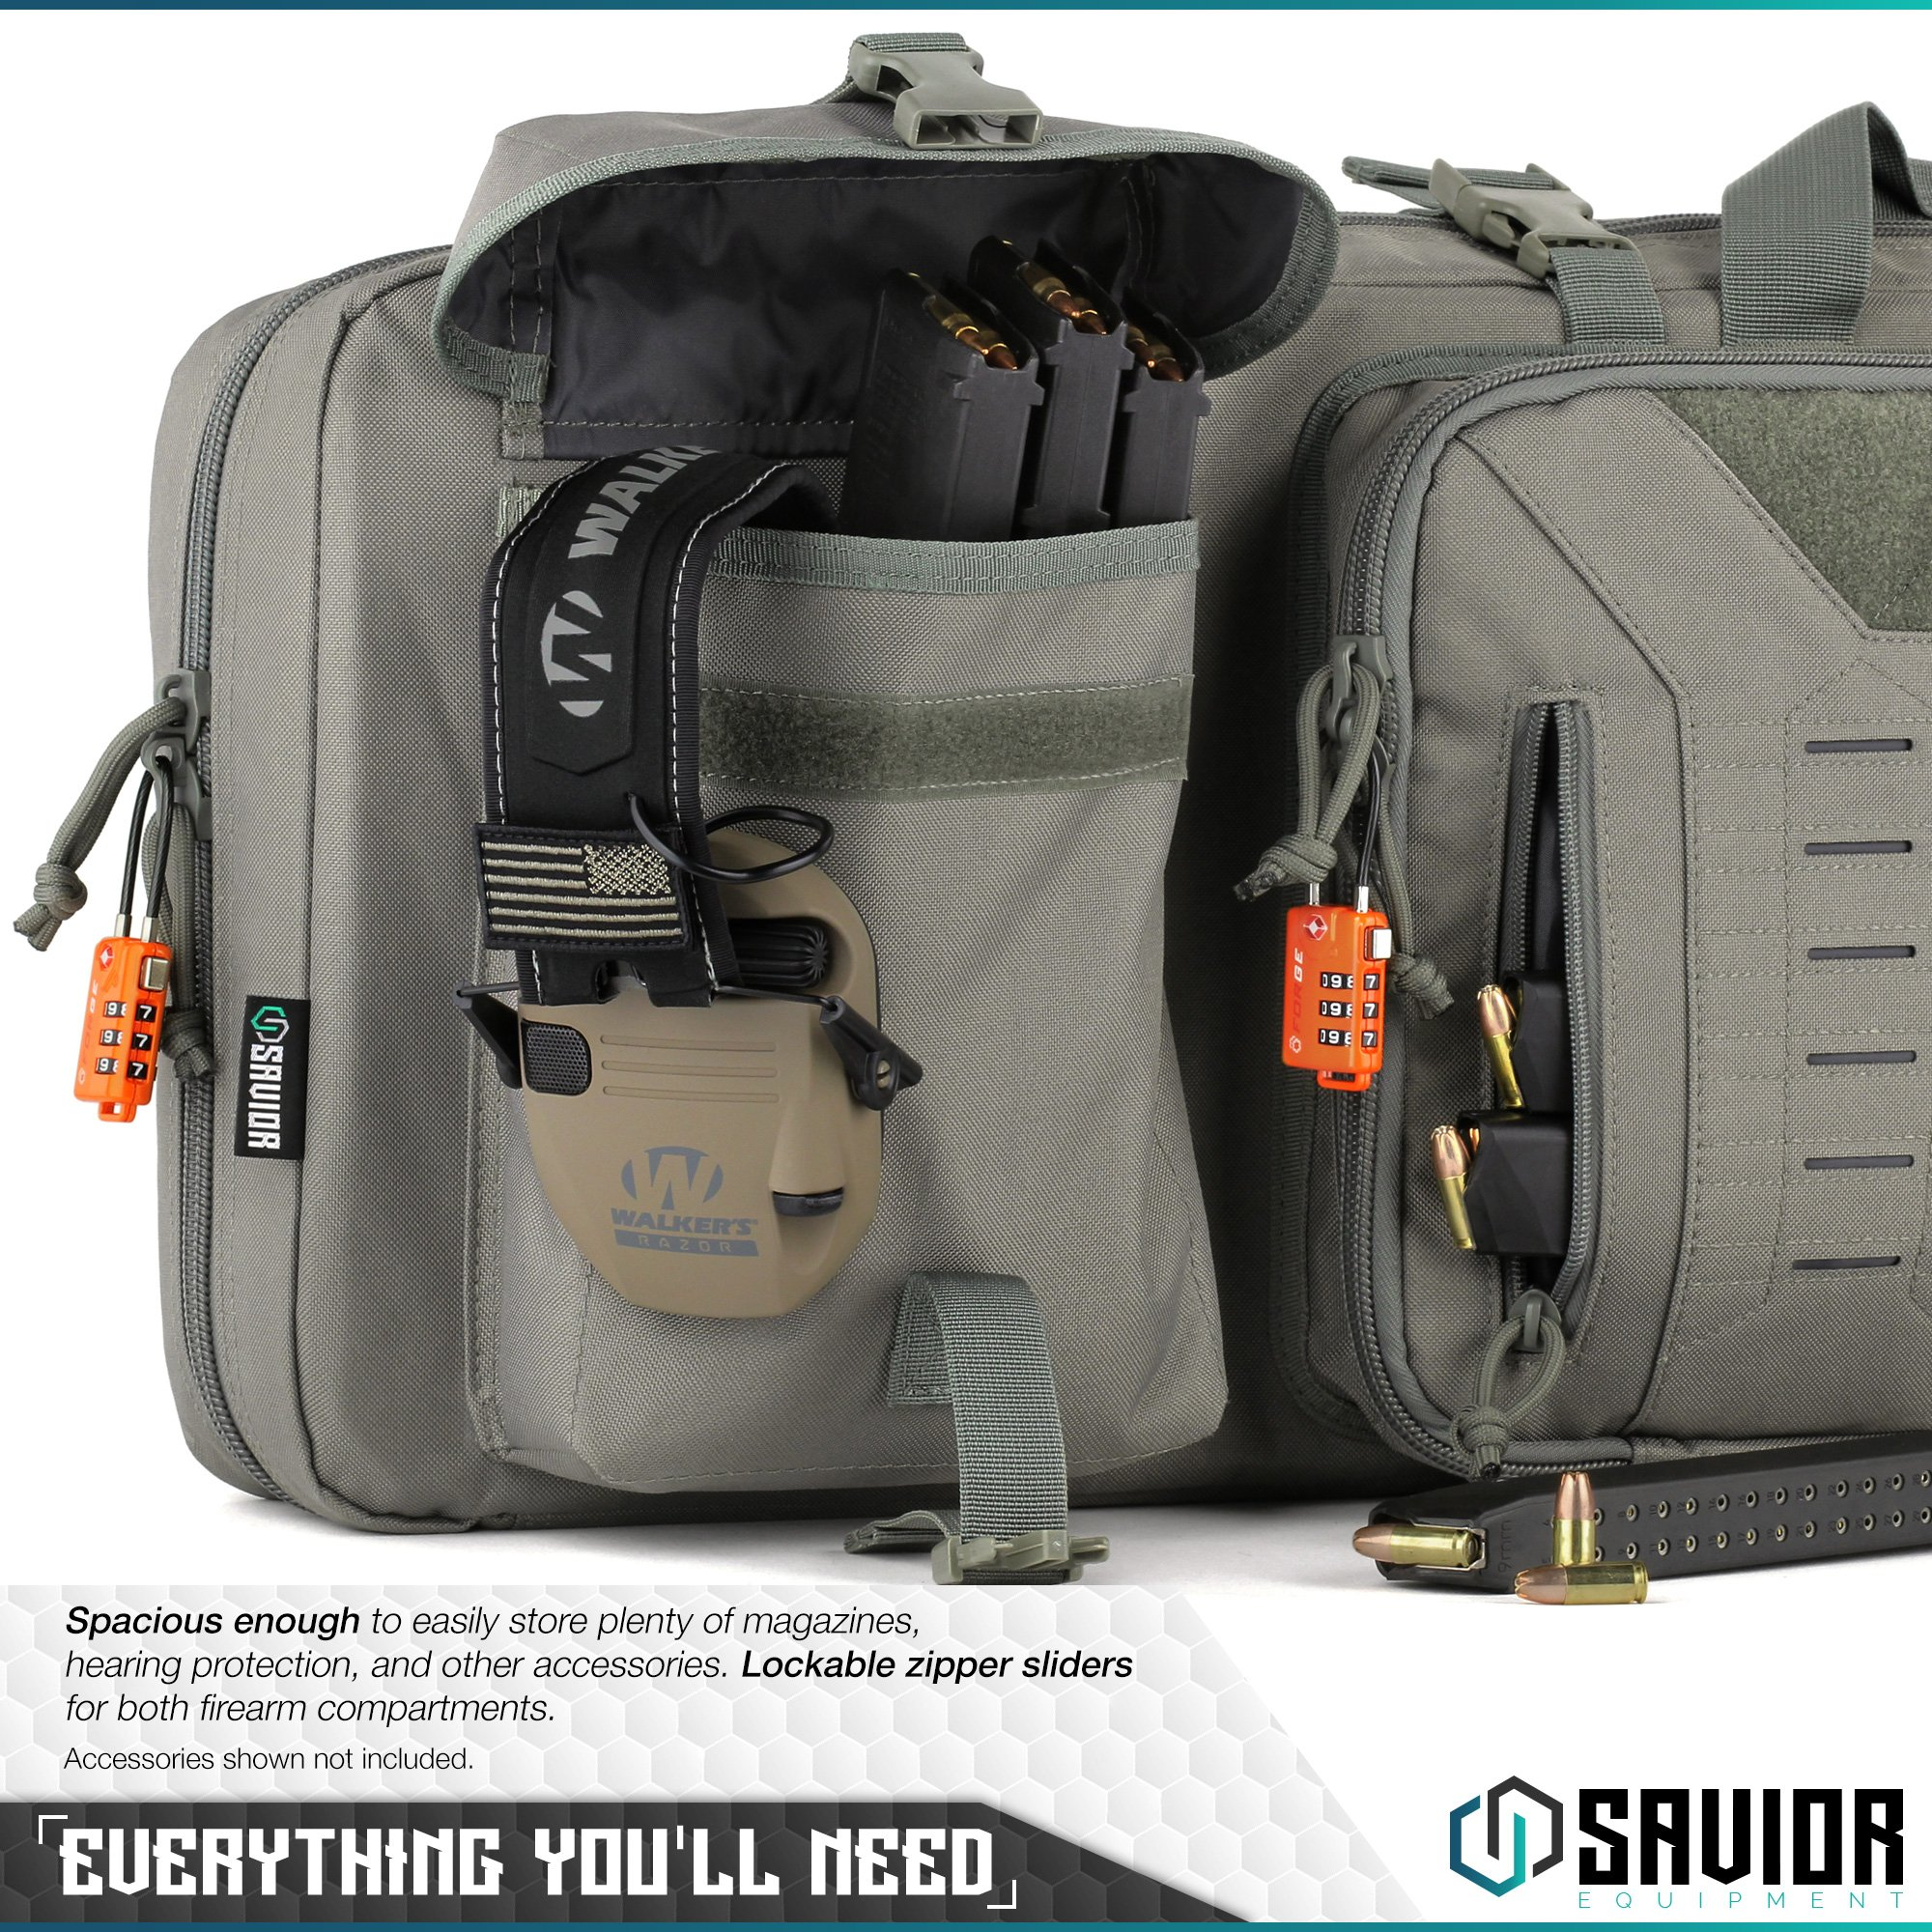 Savior Equipment Urban Warfare Tactical Double Carbine Long Rifle Bag Gun Case Firearm Backpack w/Pistol Handgun Case - 42 Inch Ash Gray by Savior Equipment (Image #5)